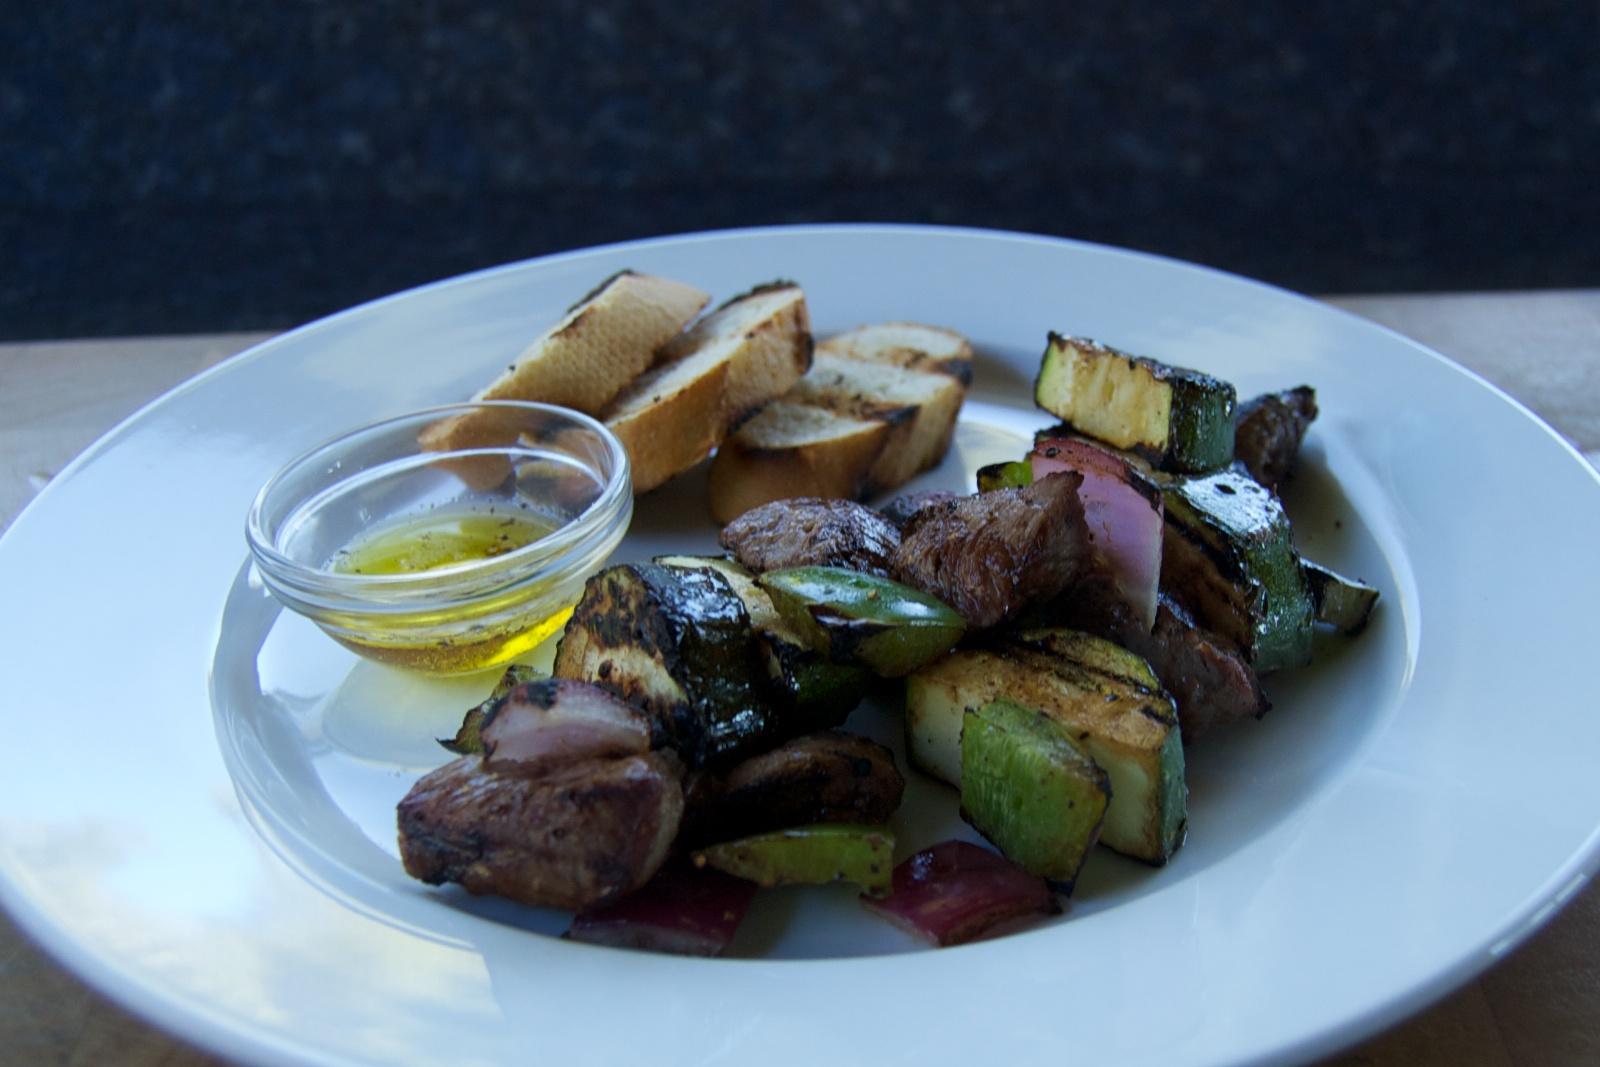 http://blog.rickk.com/food/2013/09/19/ate.2013.09.19.l2.jpg